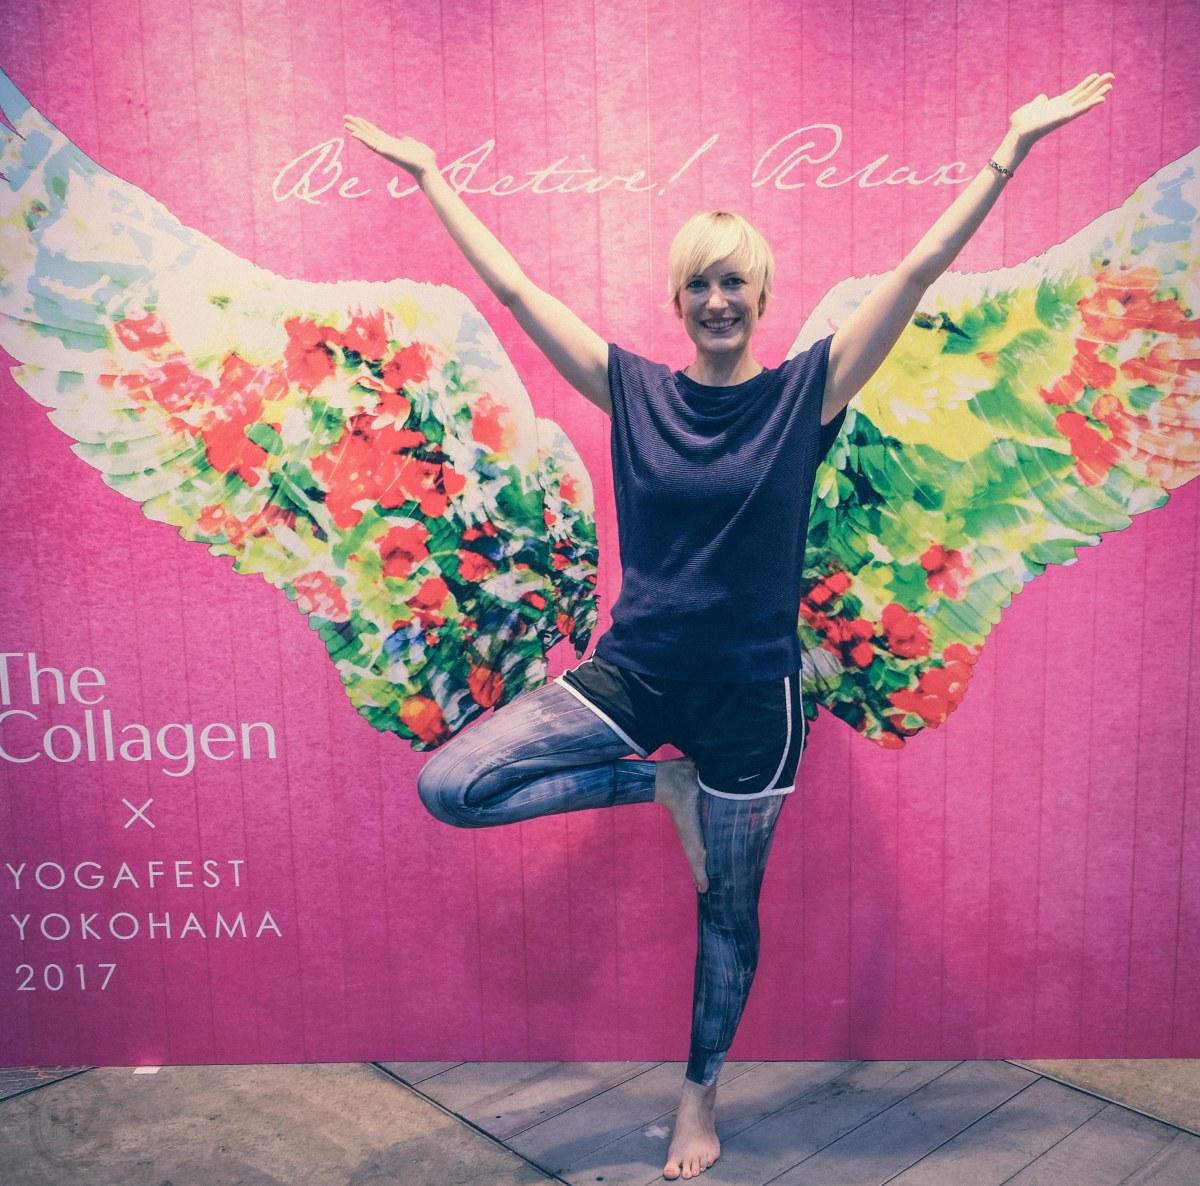 Nachtrag: Das Yogafest Yokohama 2017